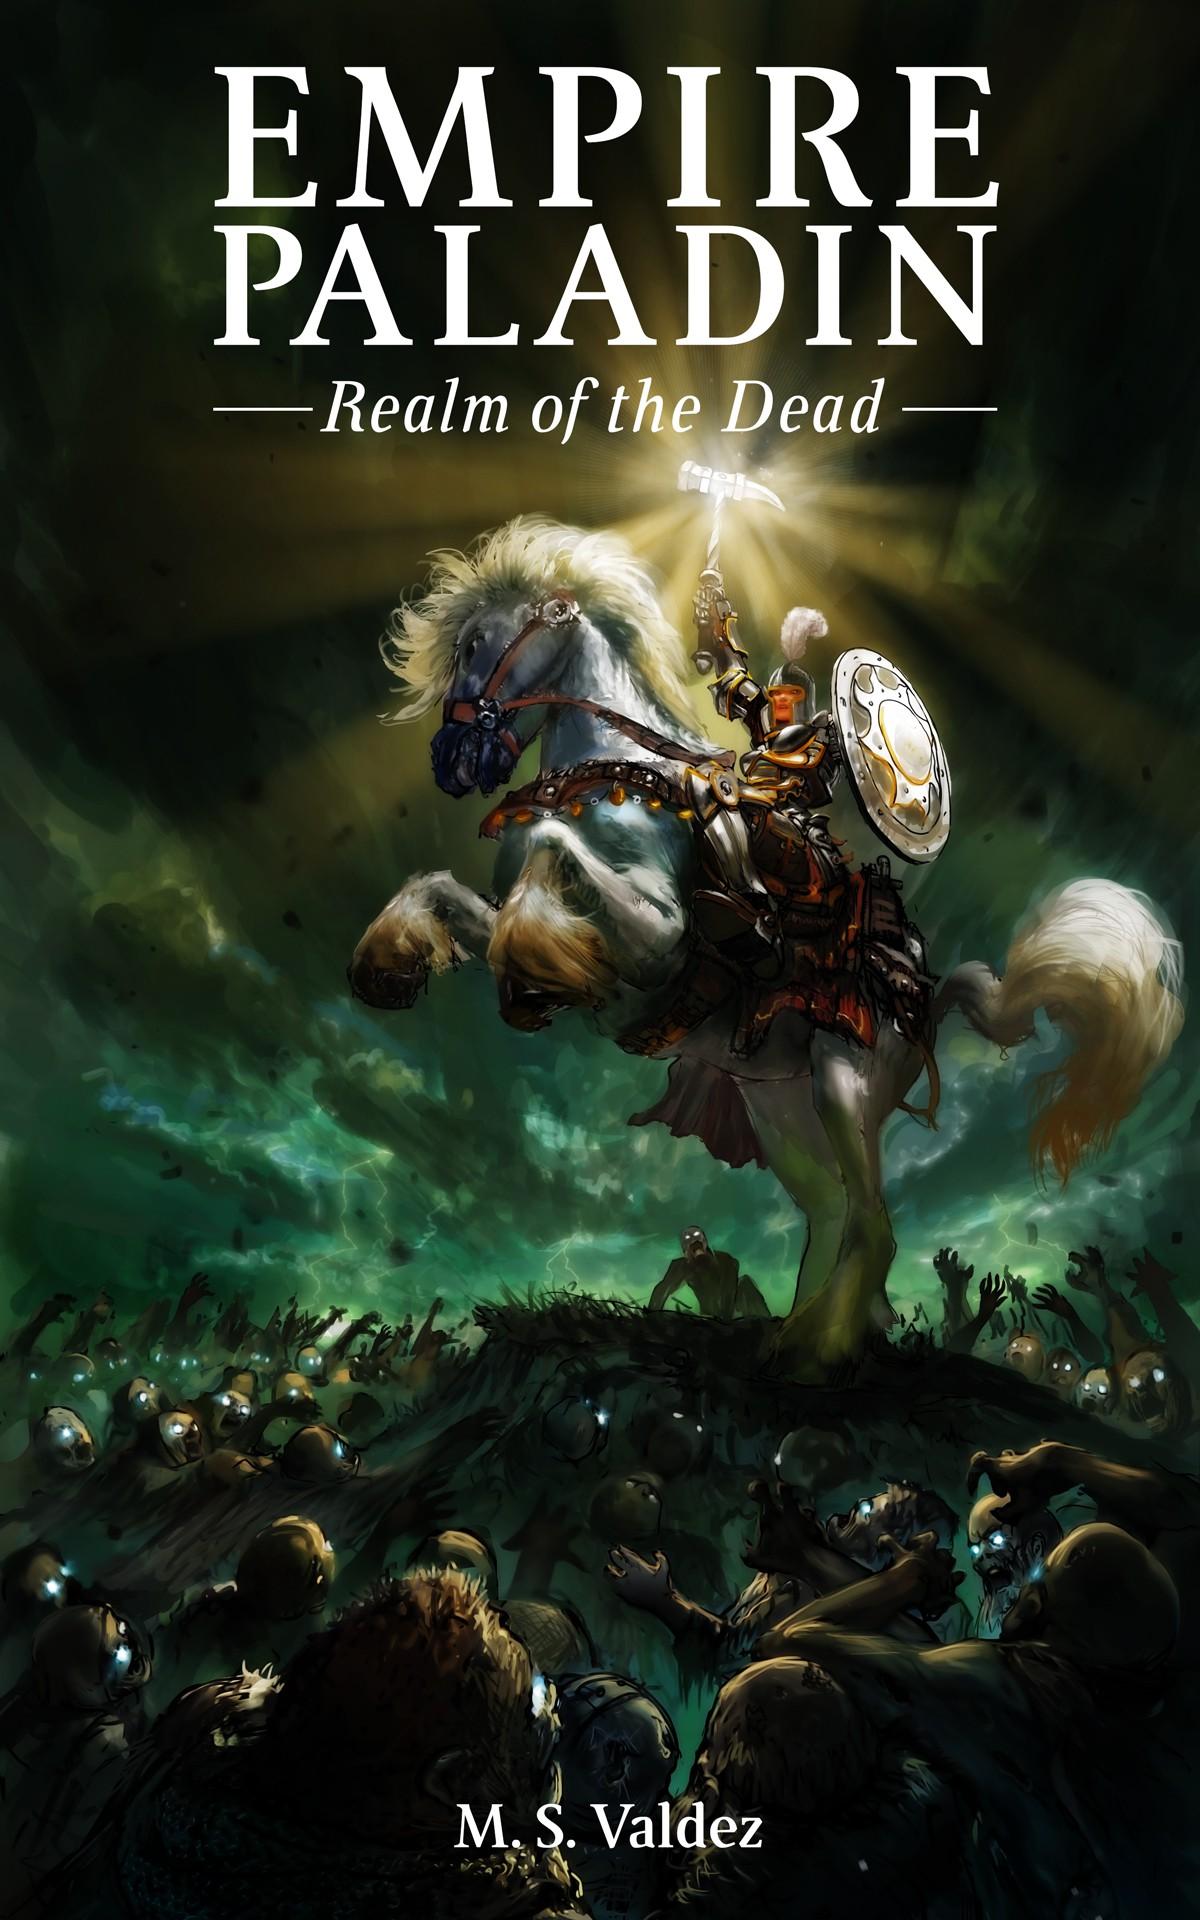 Medieval Historical-Fantasy ebook/novel cover art!